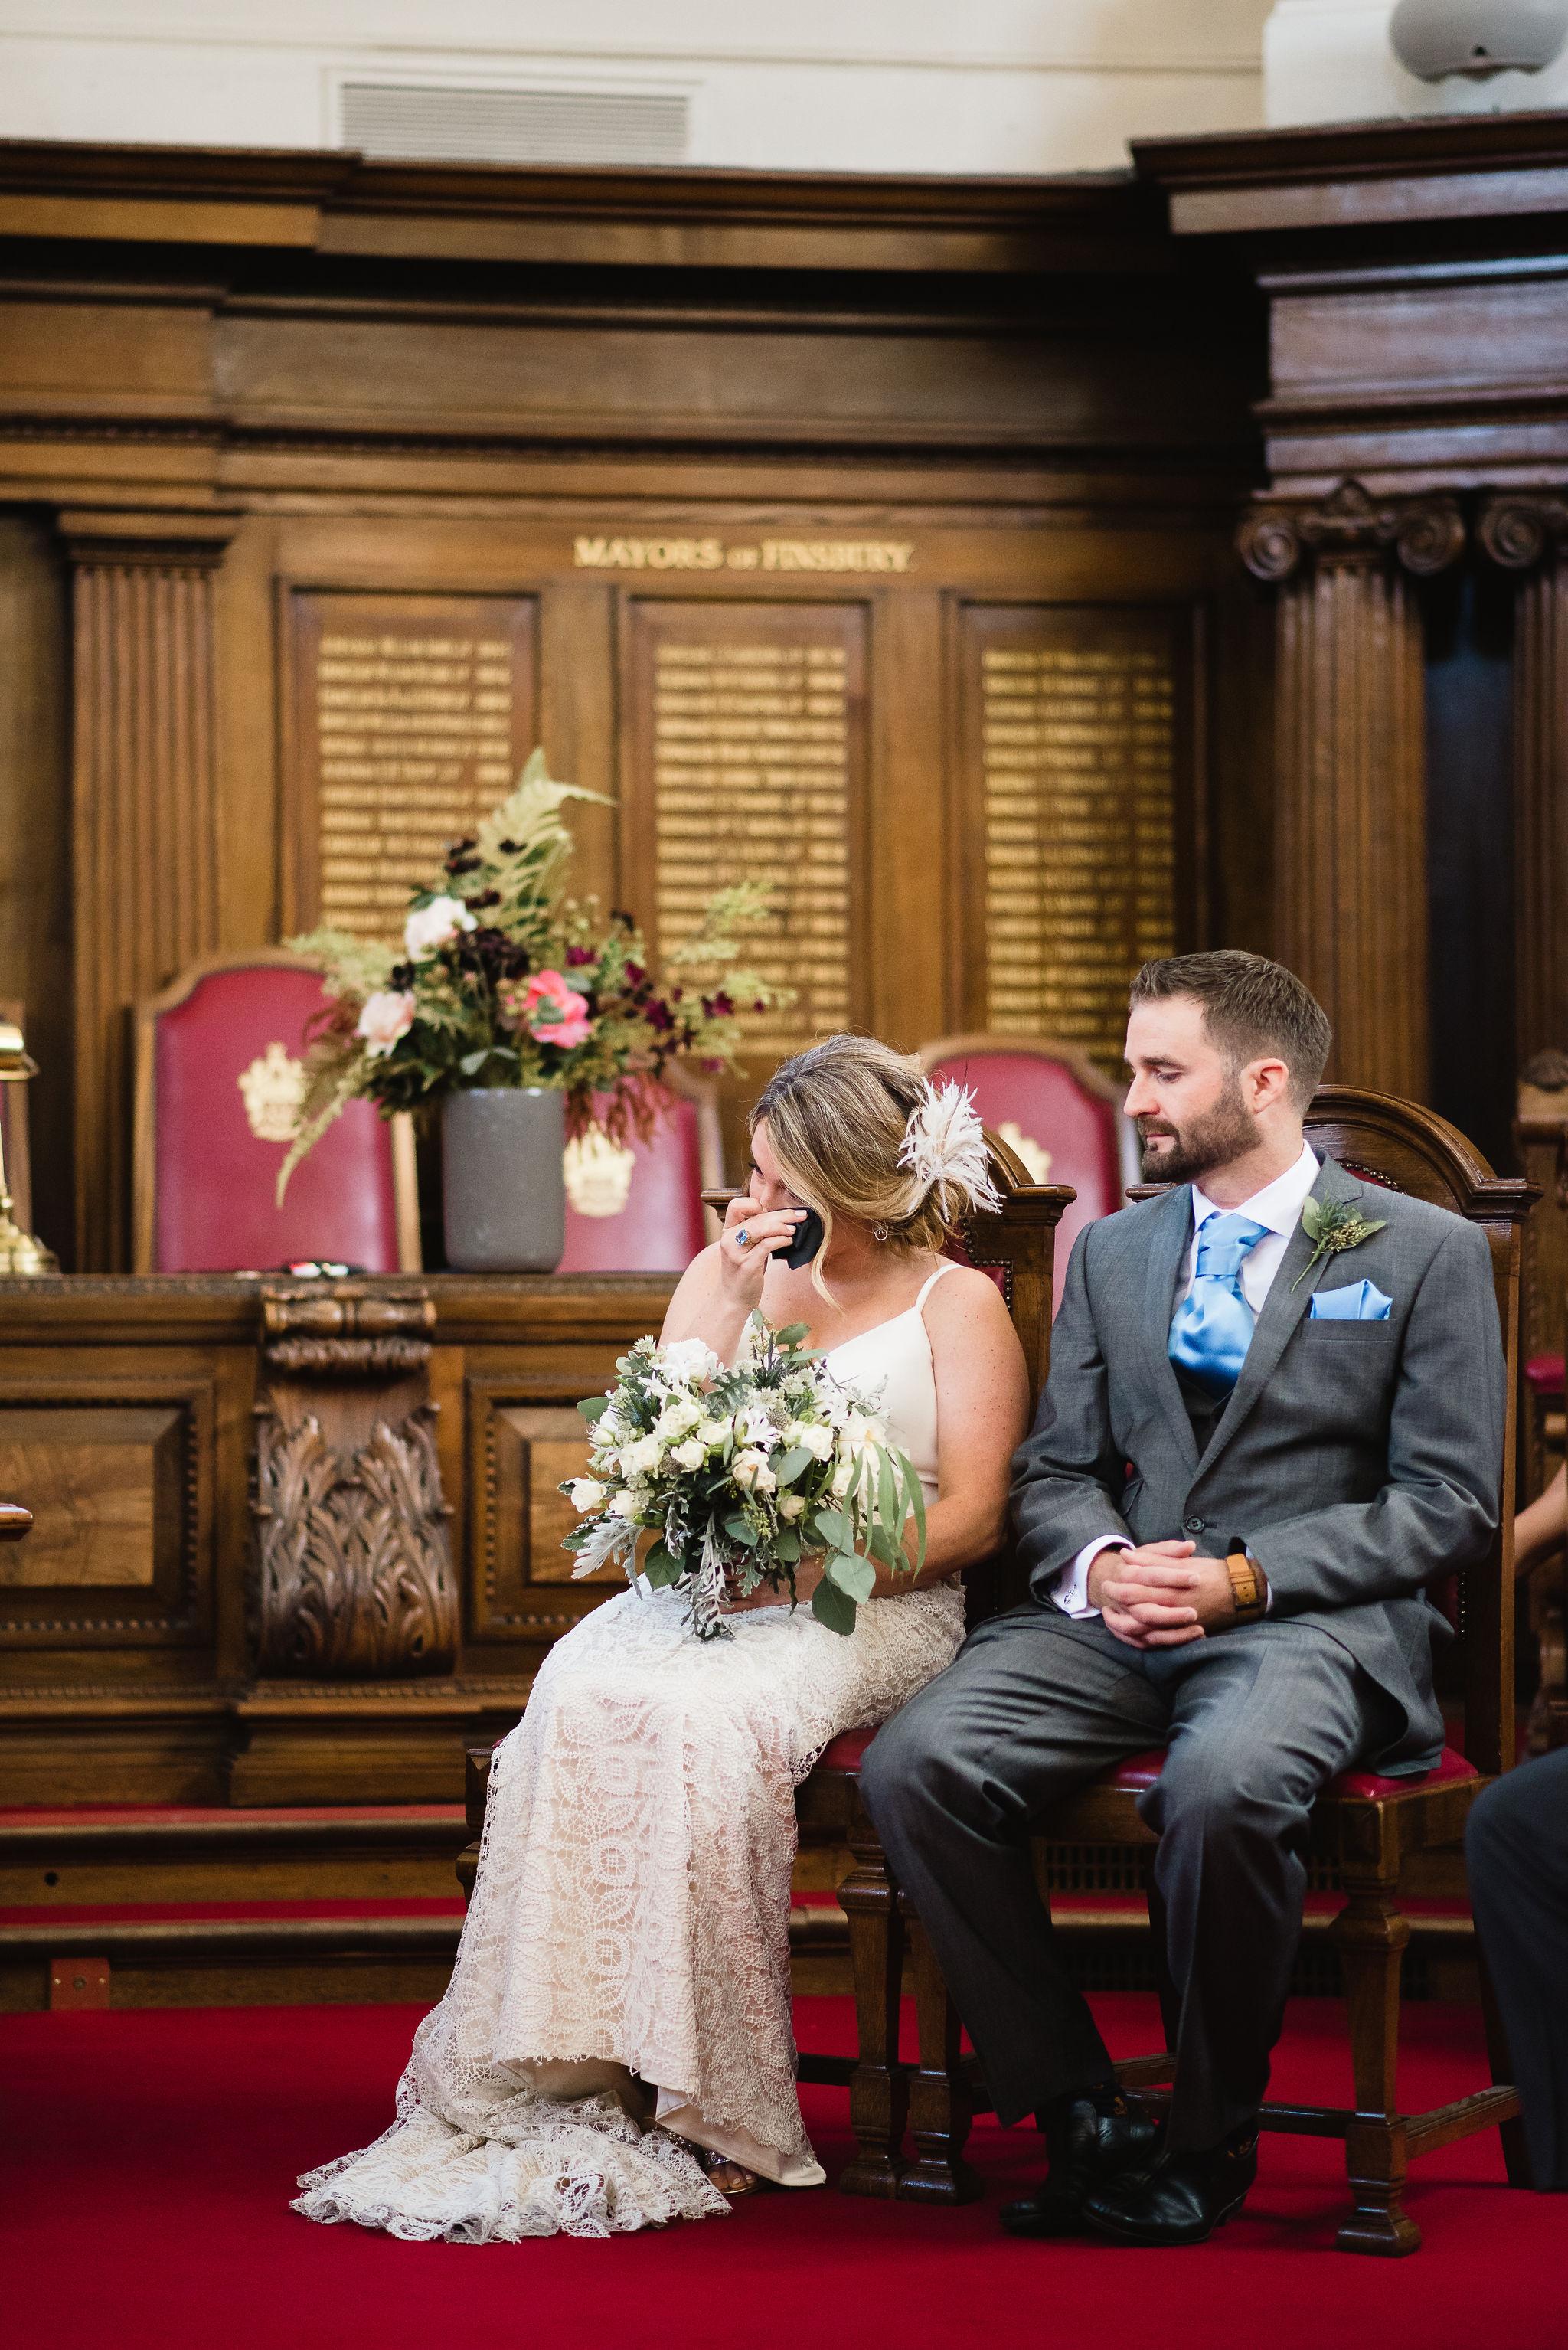 Islington_Town_Hall_Wedding_Prince_Albert_Pub_Camden_24.jpg